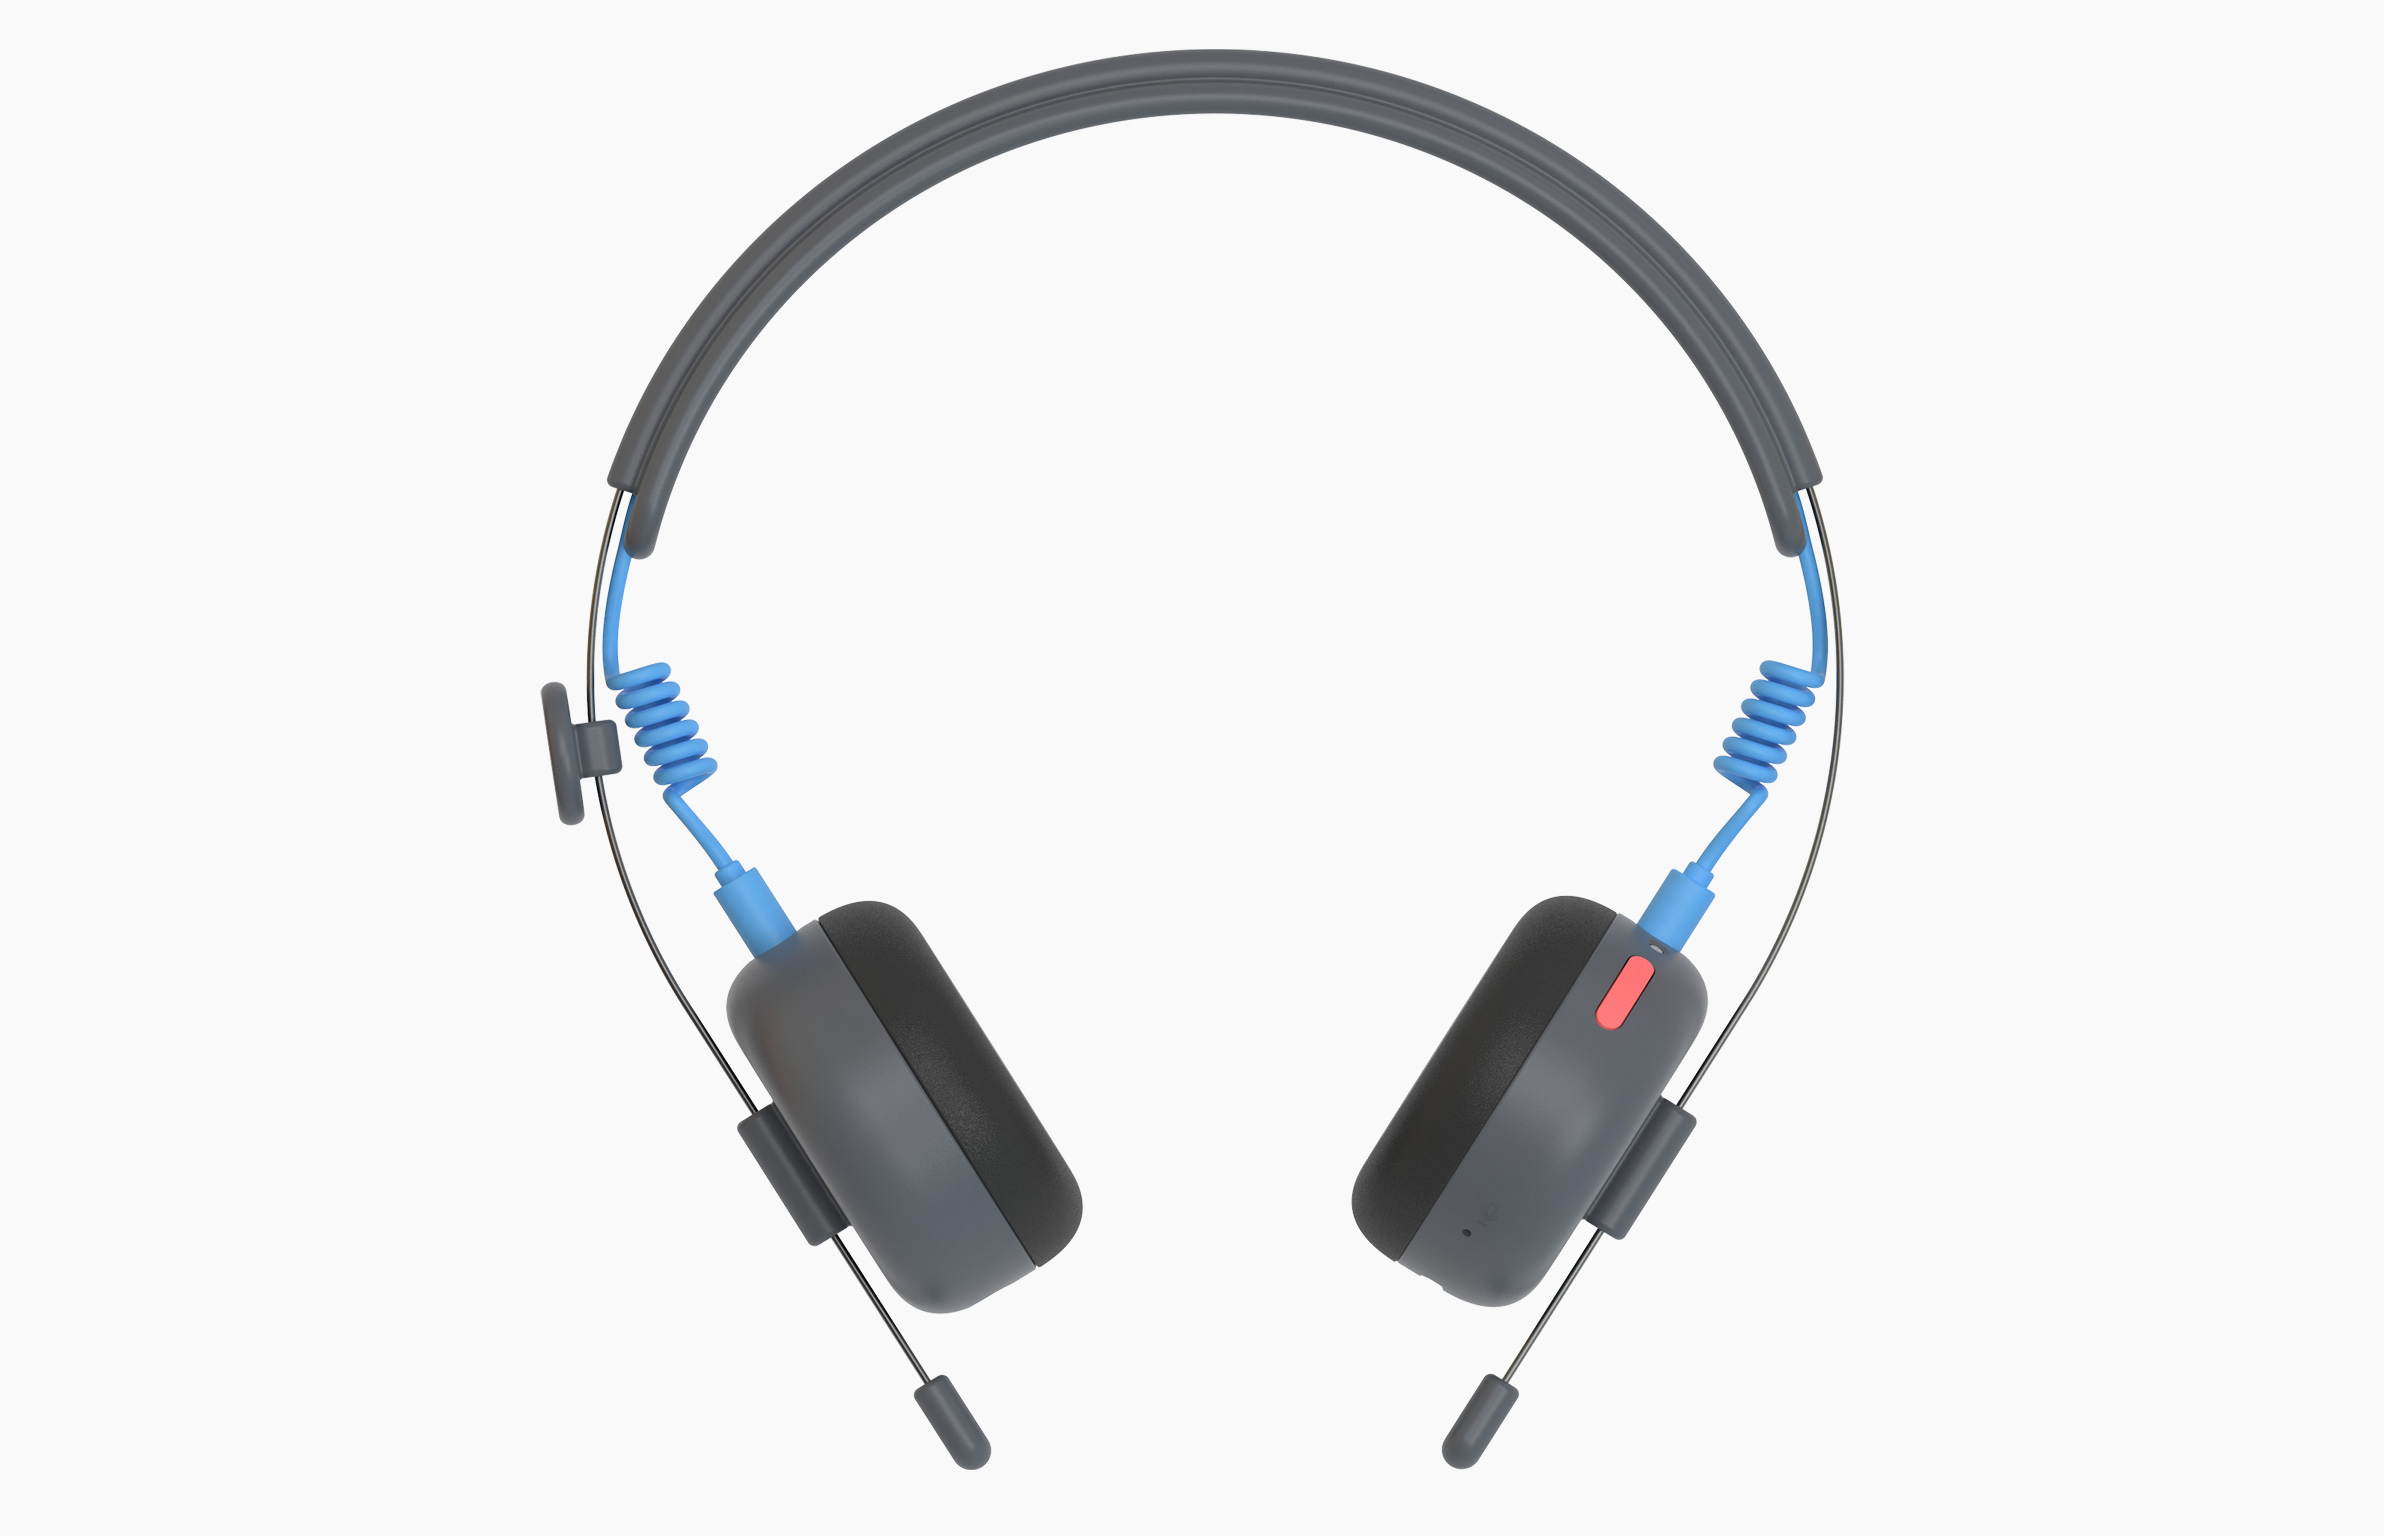 Kano Headphones